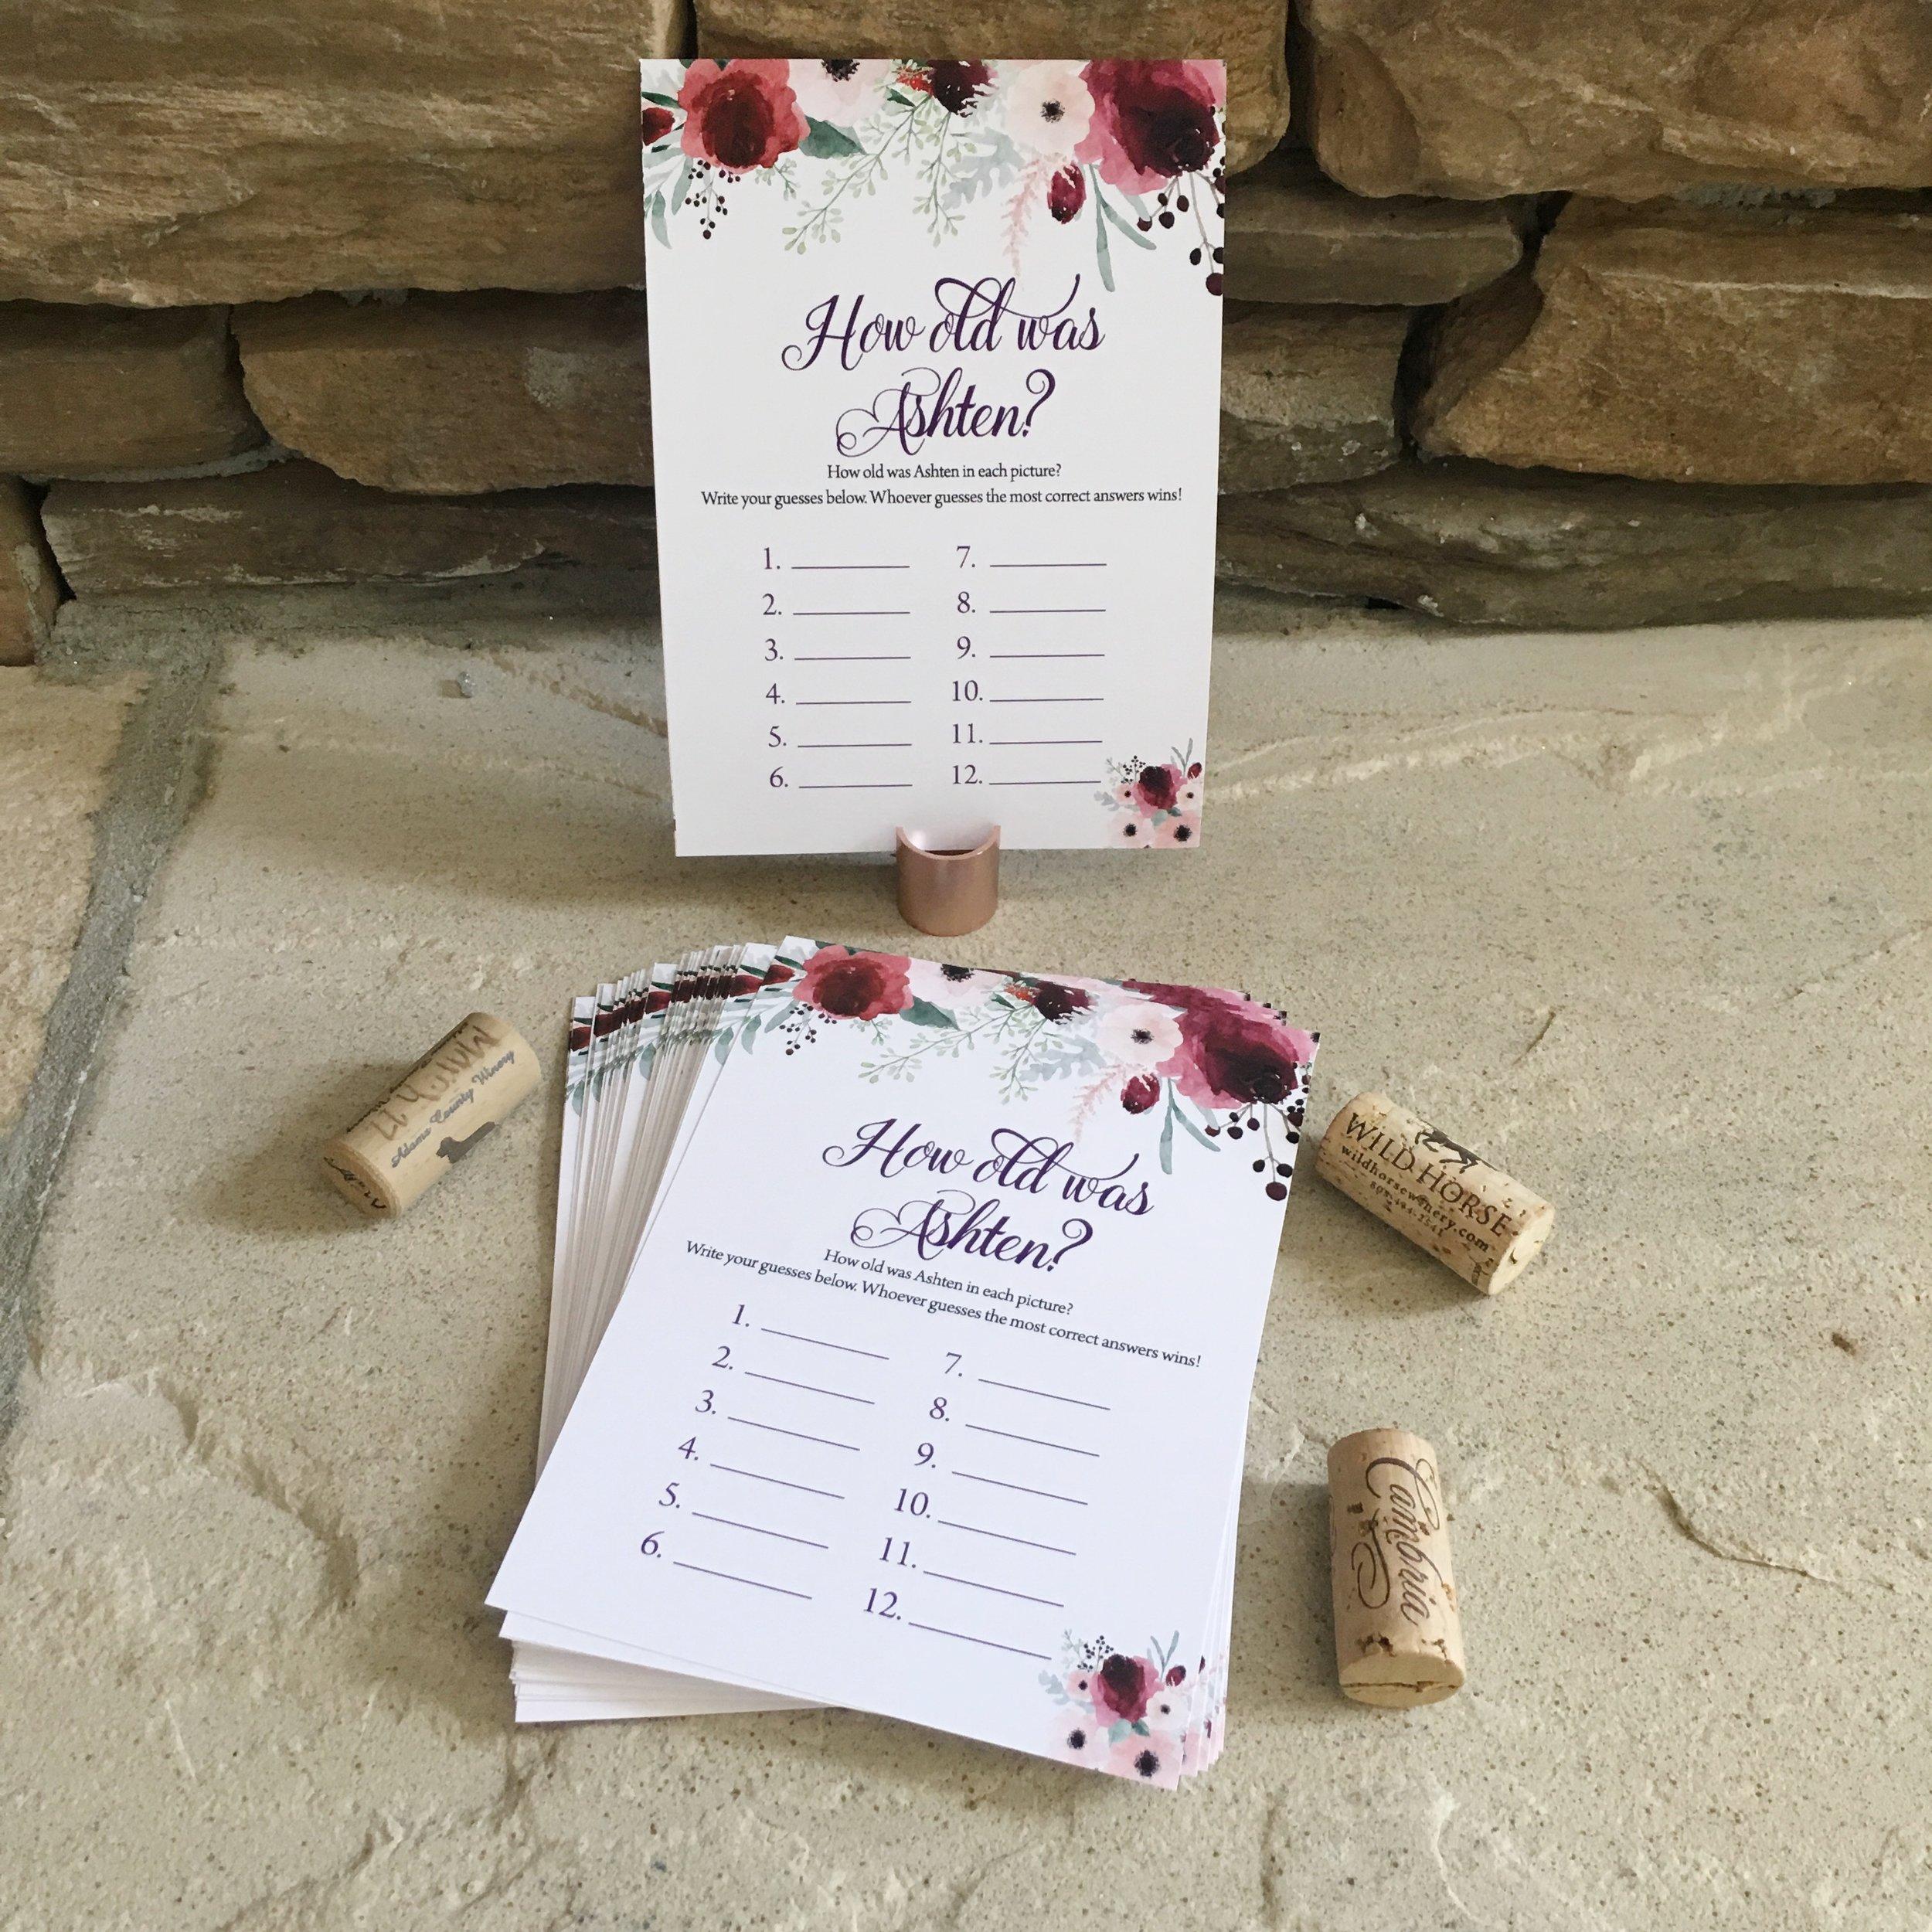 Central PA, York PA, JesSmith Designs, custom, wedding, invitations, bridal, announcements, save the date, birth, baby, motherhood, hanover, calligraphy, handlettering-06-06 13.37.36.jpg